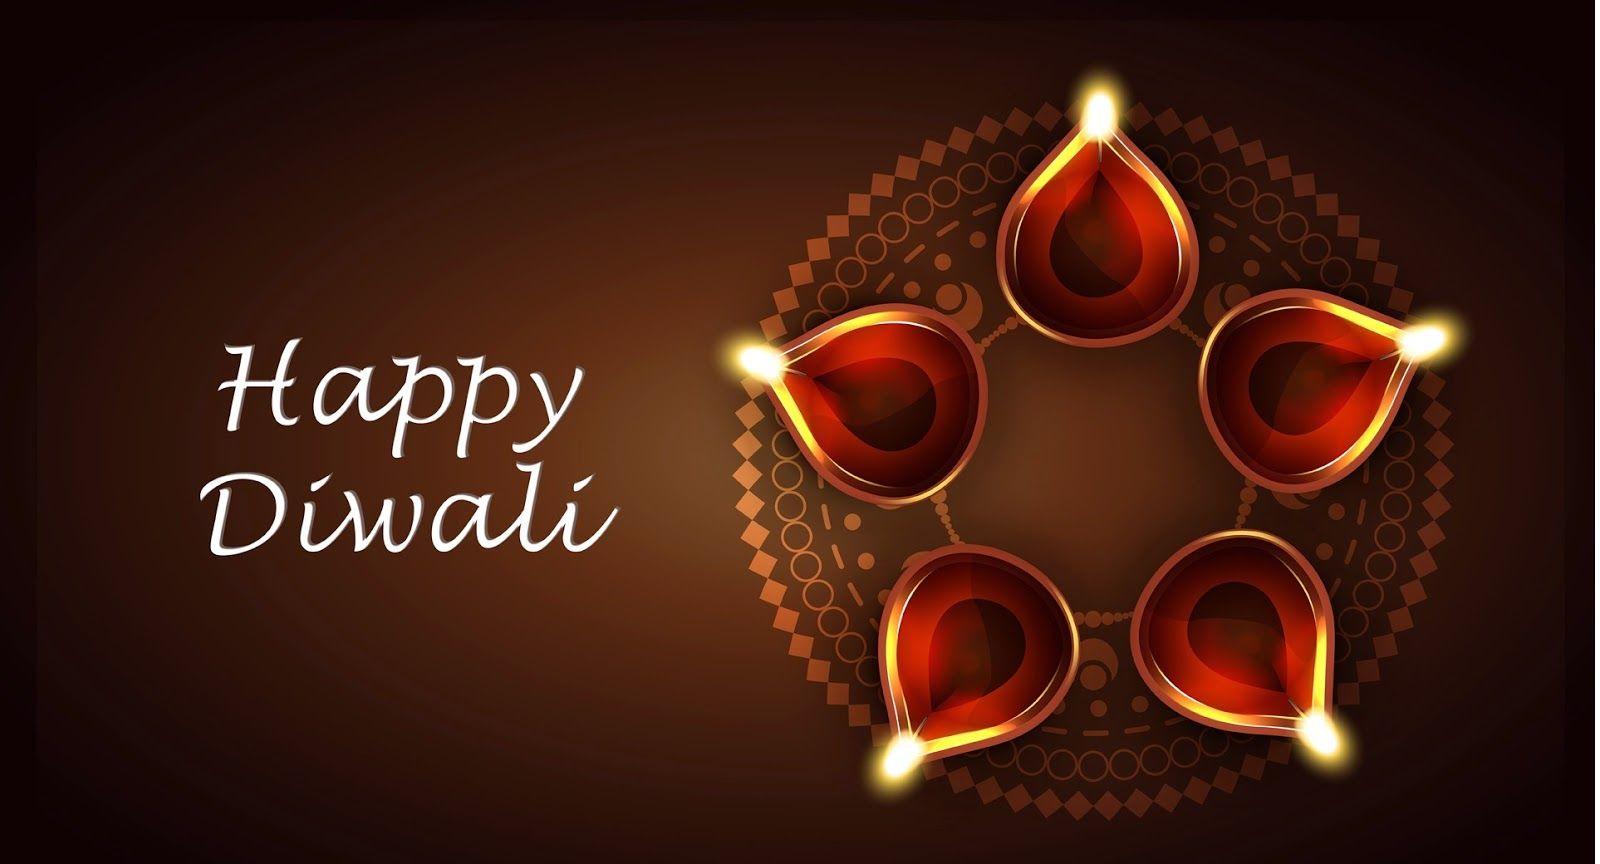 Hd happy diwali wallpapers 2014 images happy diwali wishes happy diwali wallpaper with clay lamps kristyandbryce Gallery